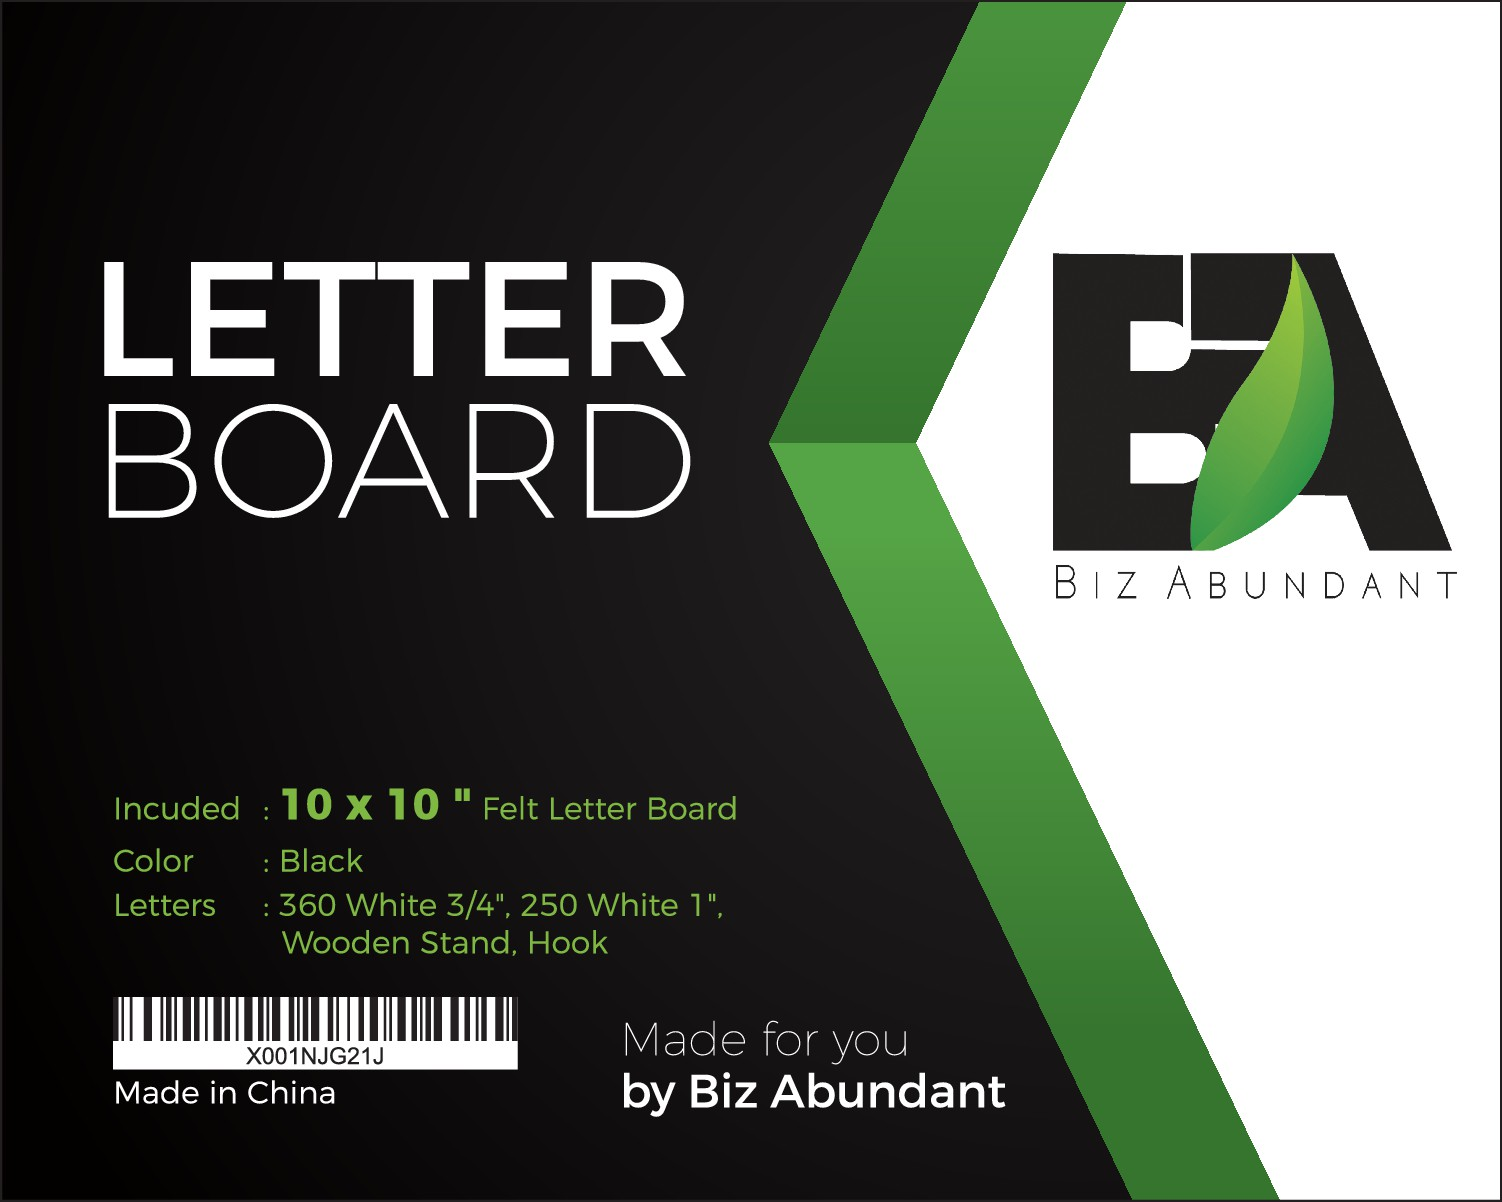 create a sleek label for felt letter board